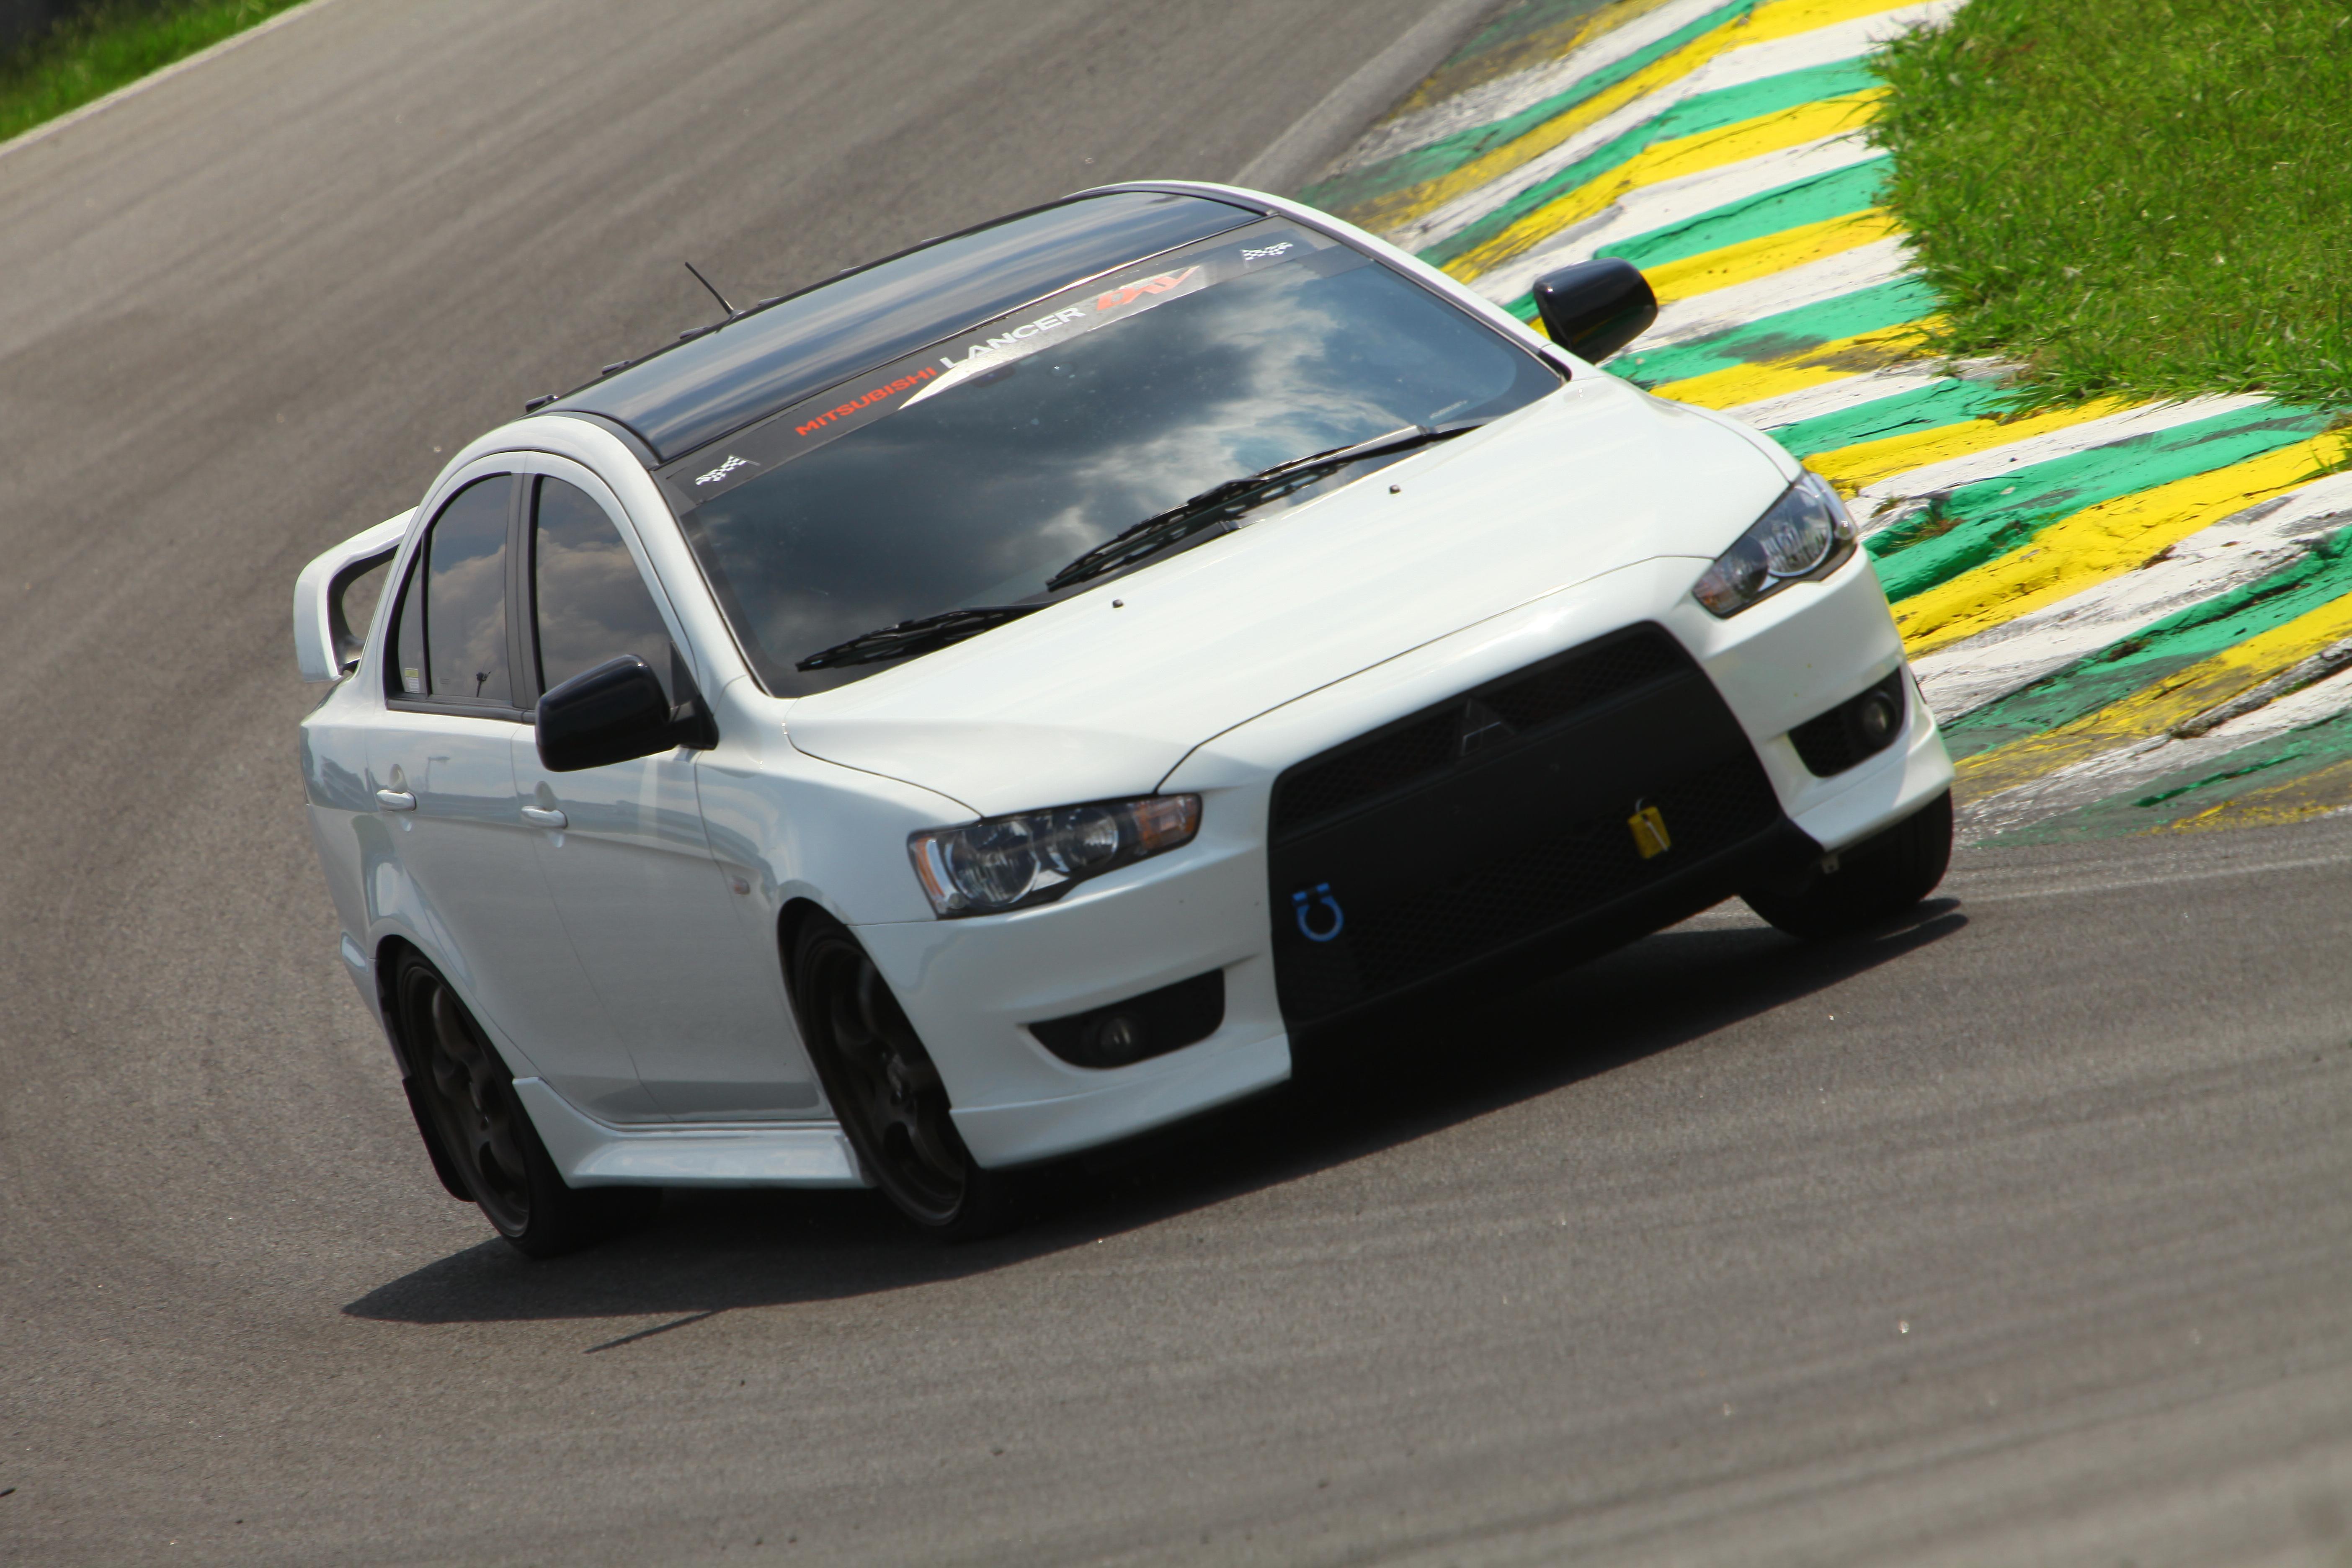 Mitsubishi Lancer MT laptimes, specs, performance data - FastestLaps com